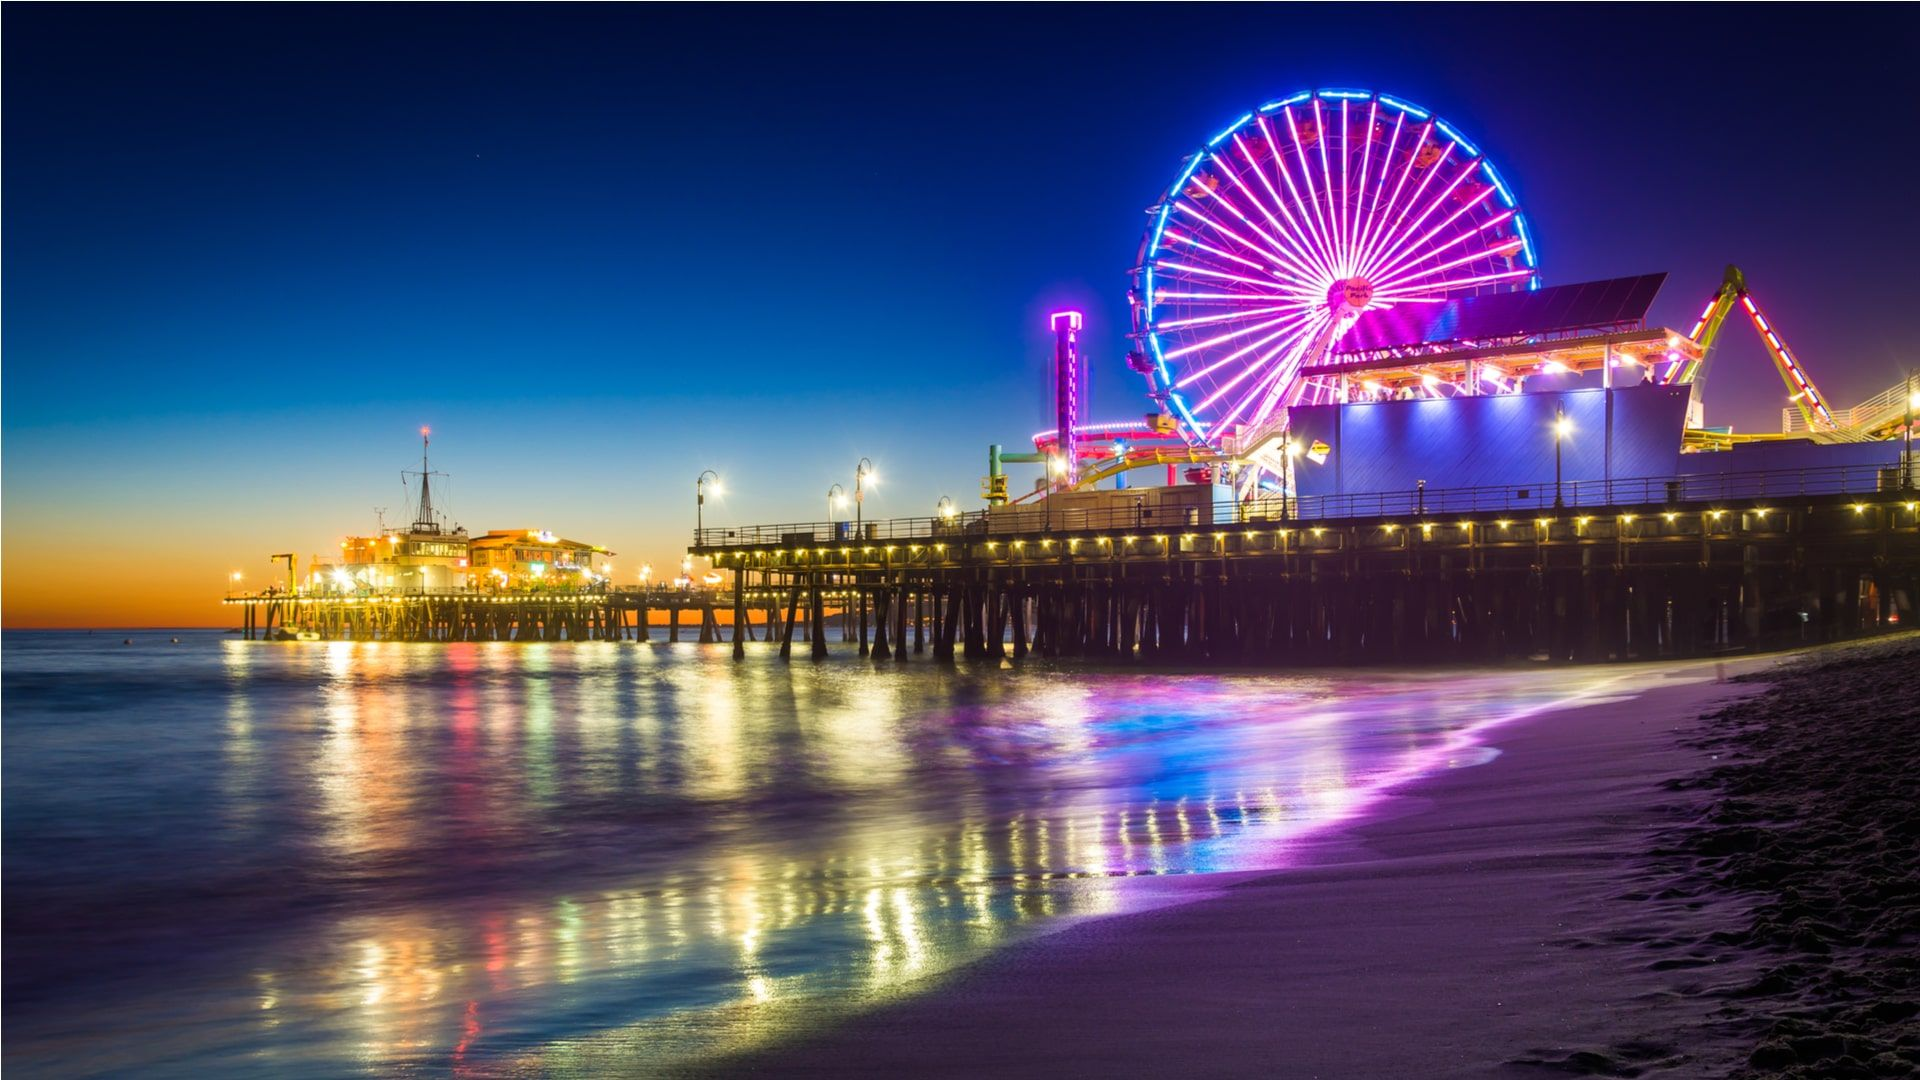 Santa Monica wallpaper photo full hd